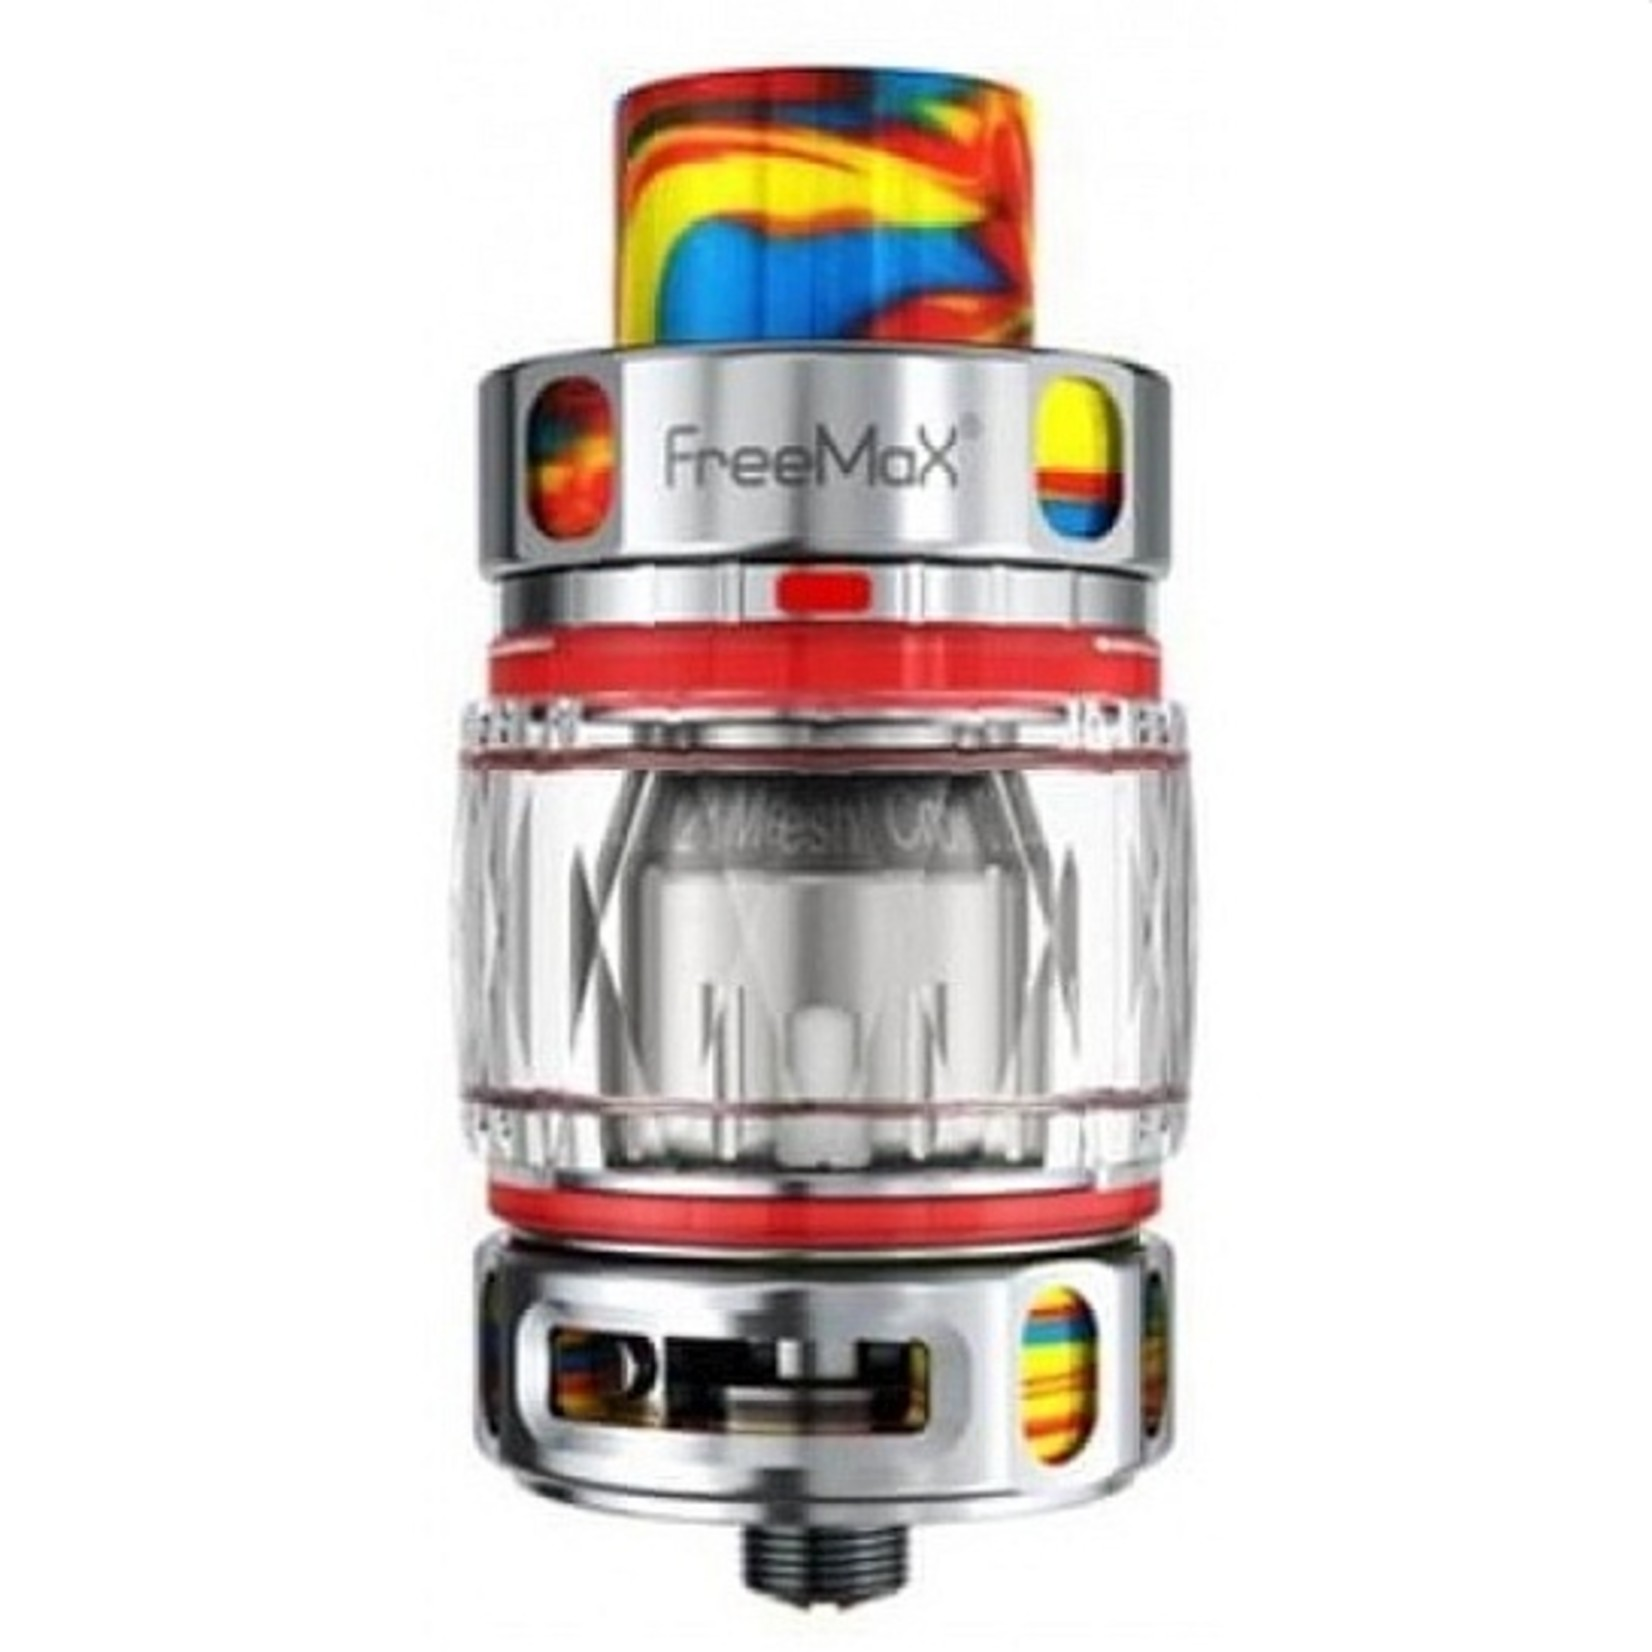 Freemax Maxus Pro 5ml Tank